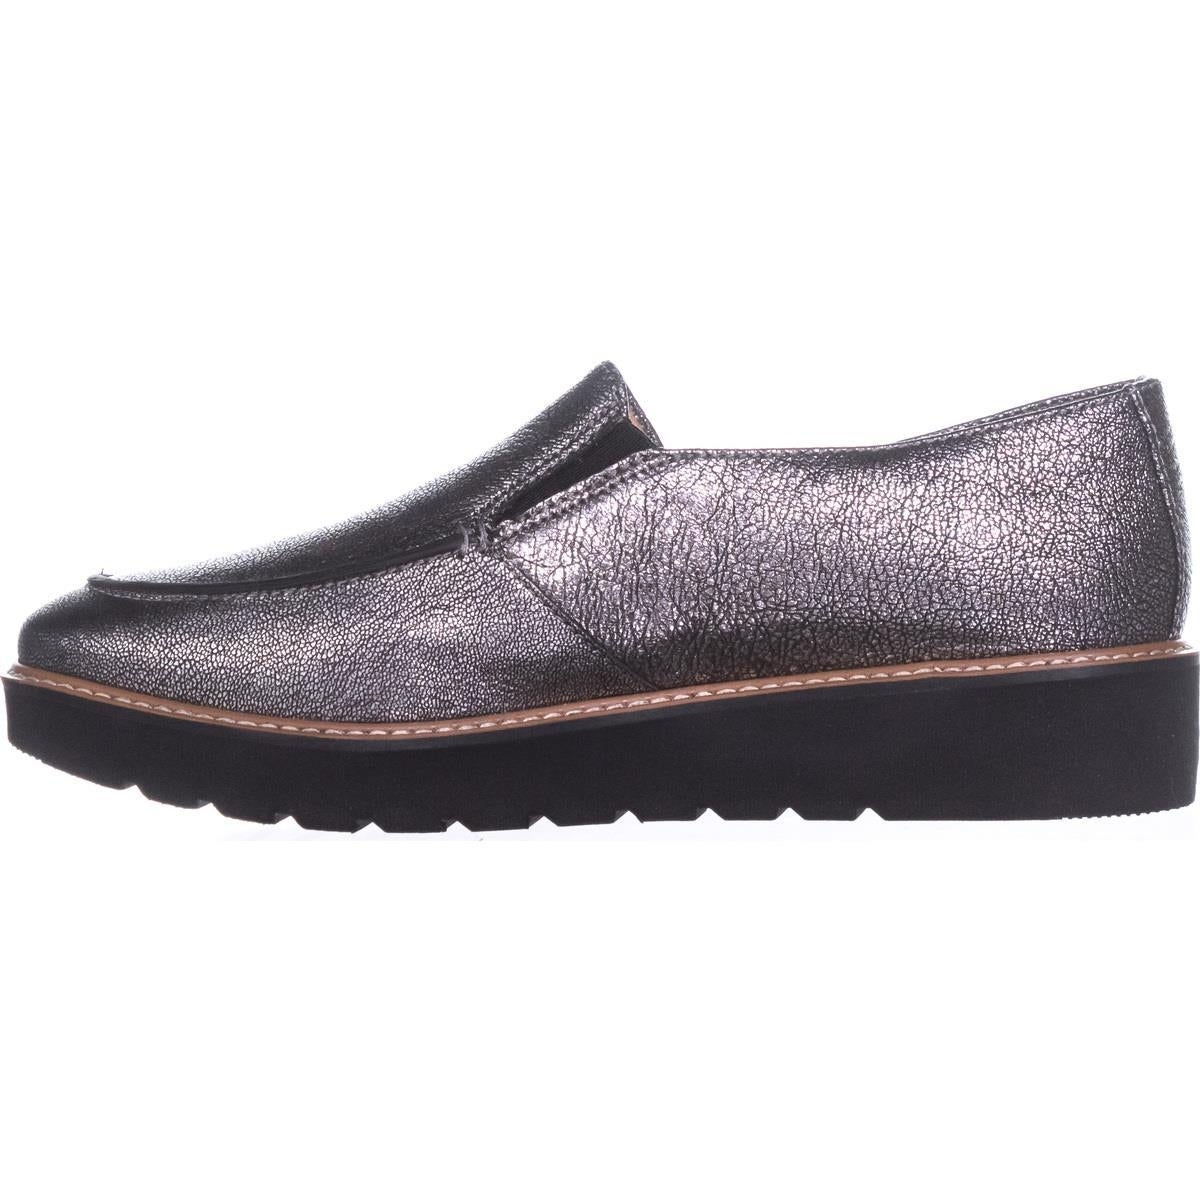 d3156de03c0 Shop naturalizer Aibileen Slip-On Loafers